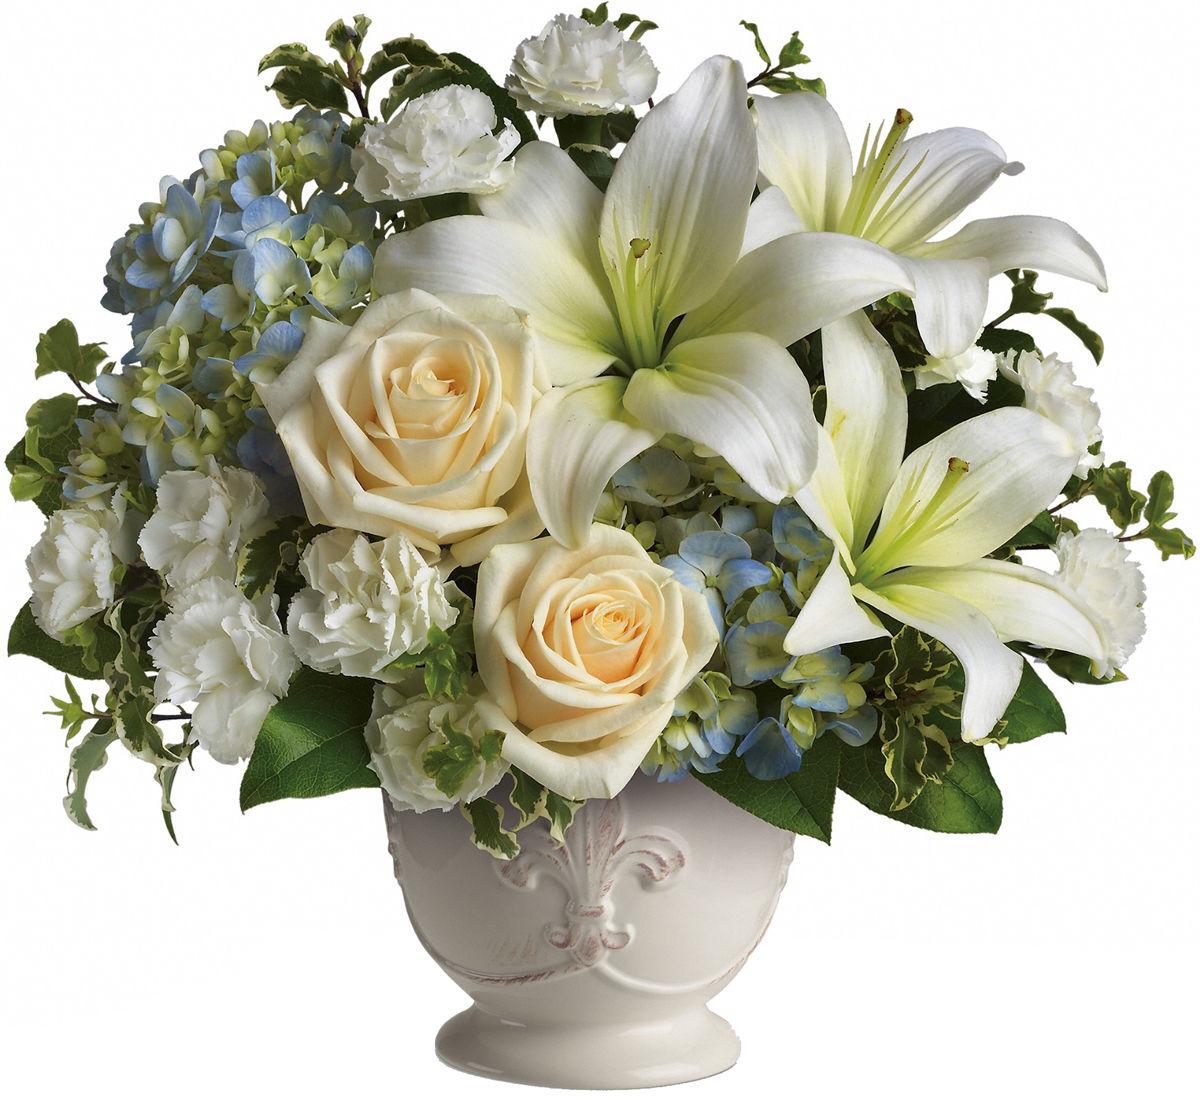 Montreal funeral flowers canada flowers beautiful dreams izmirmasajfo Gallery